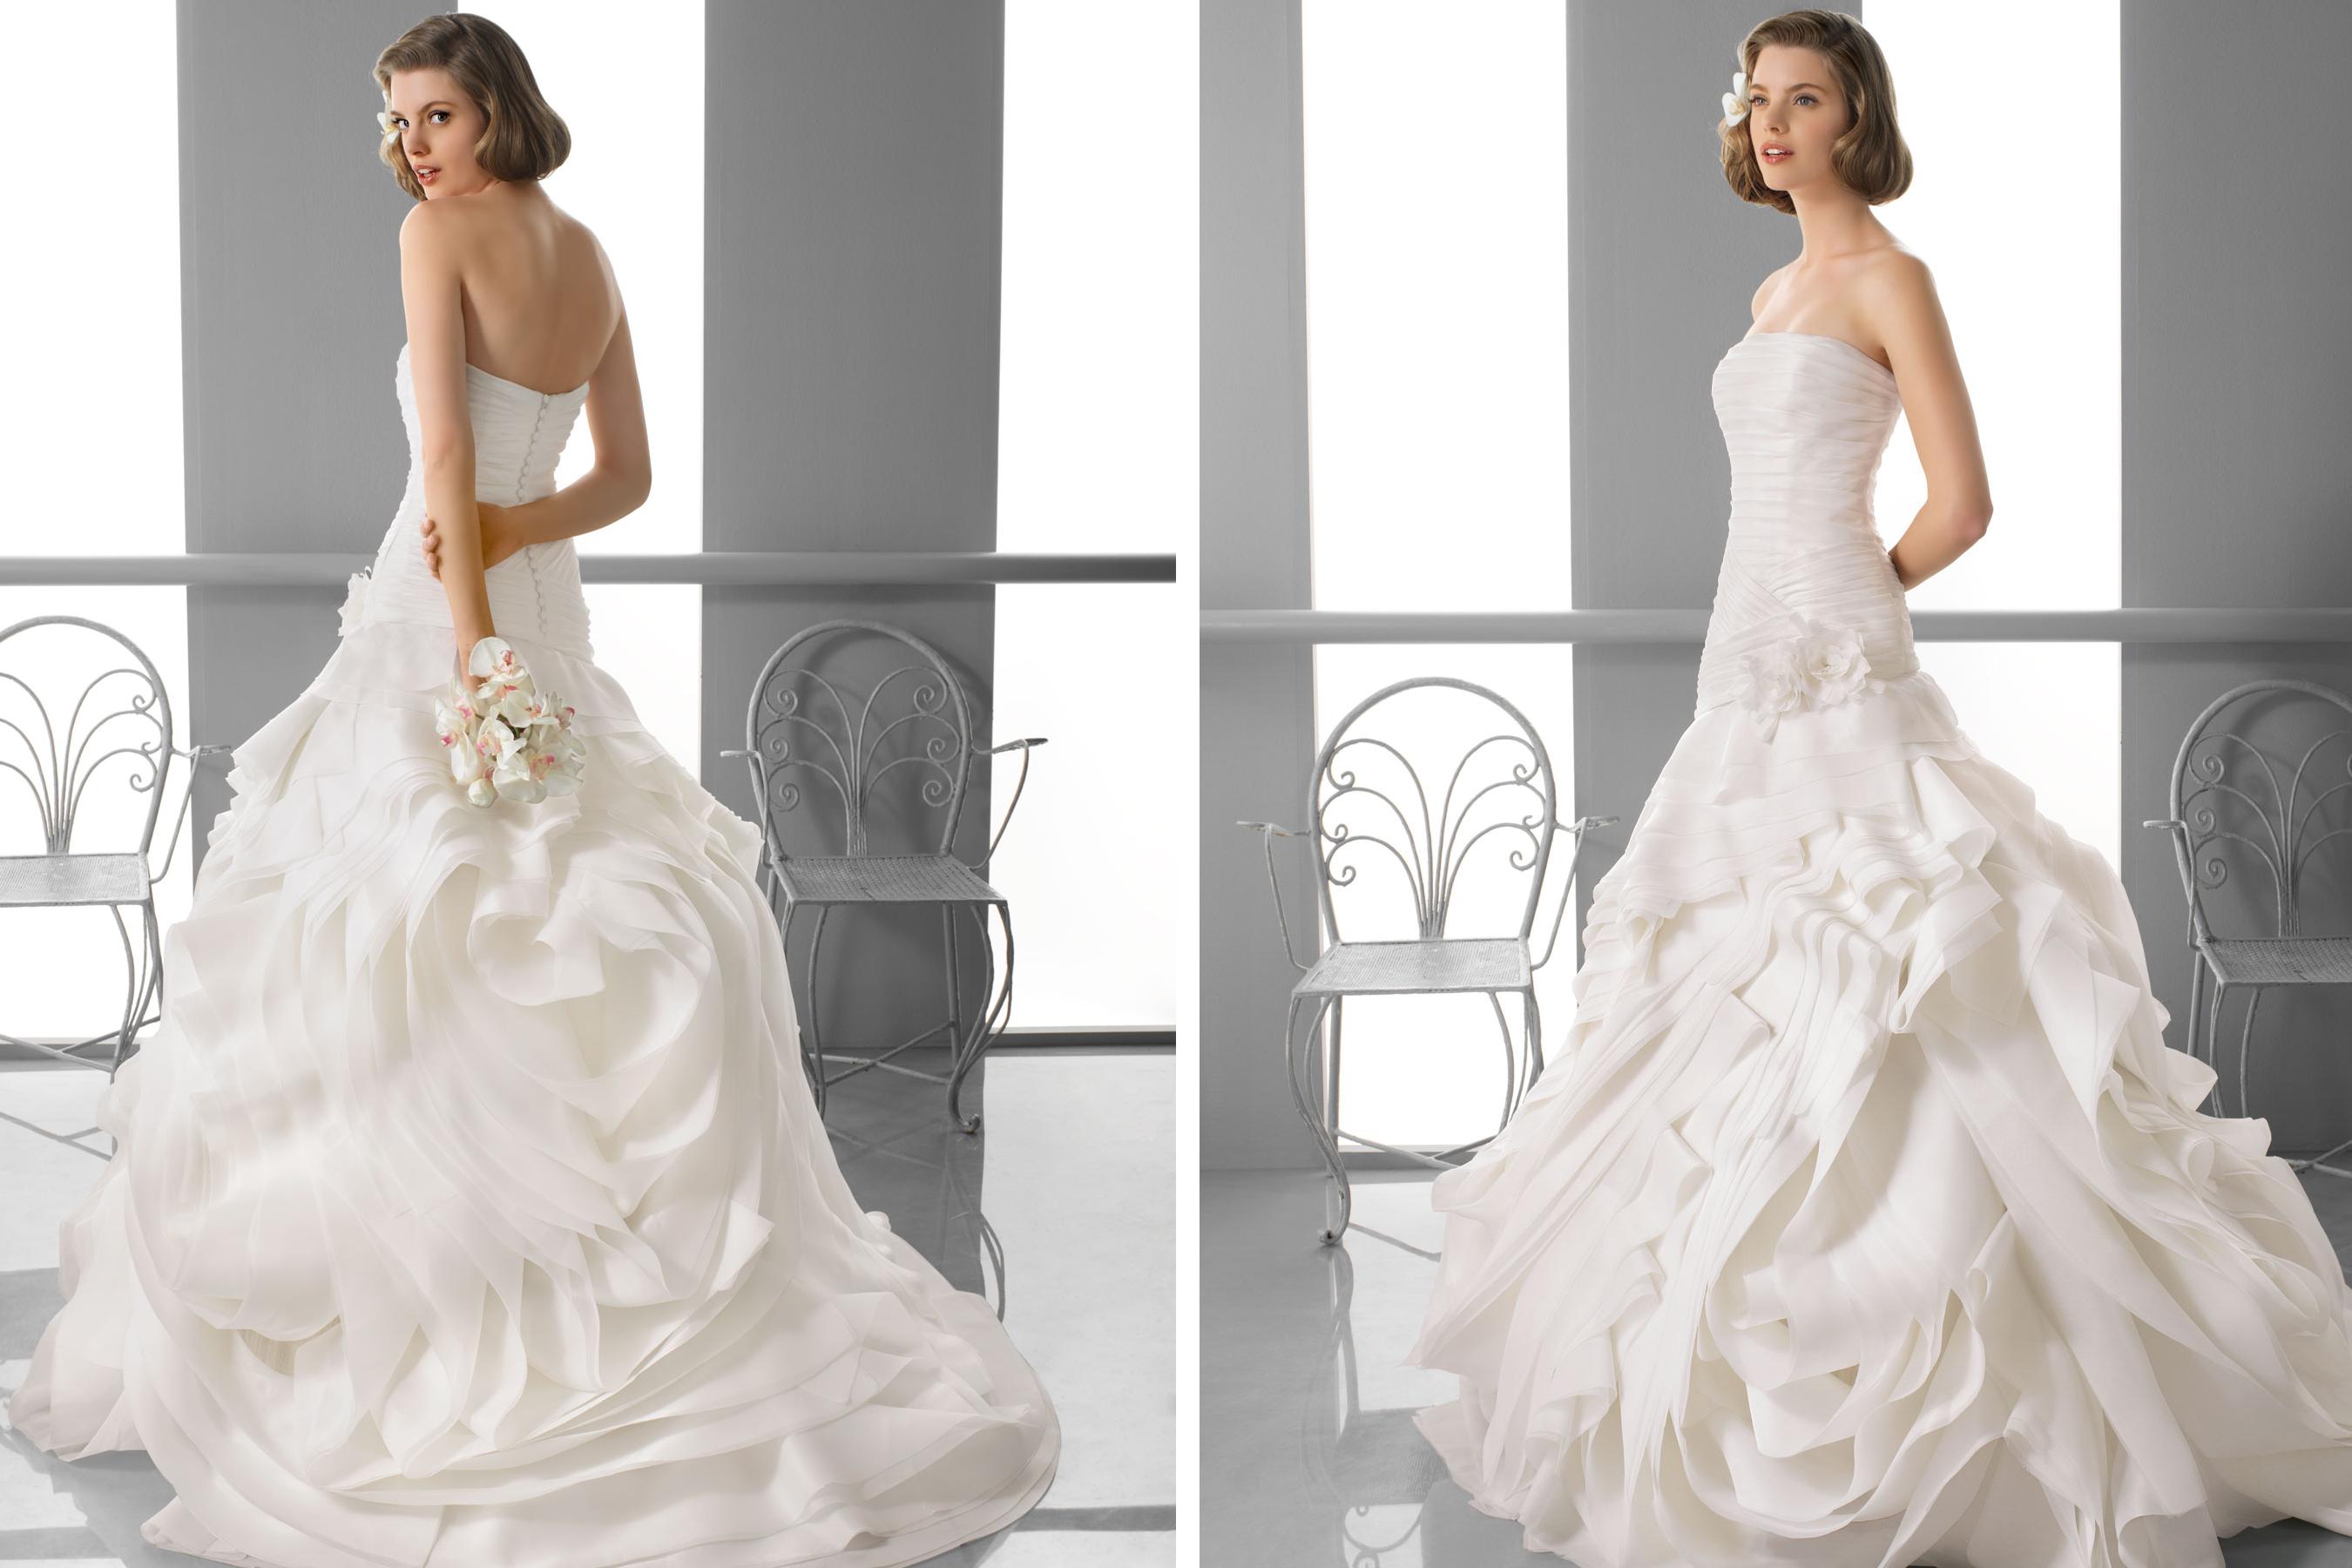 Alma novia wedding dress 2013 bridal fox for Alma novia wedding dress